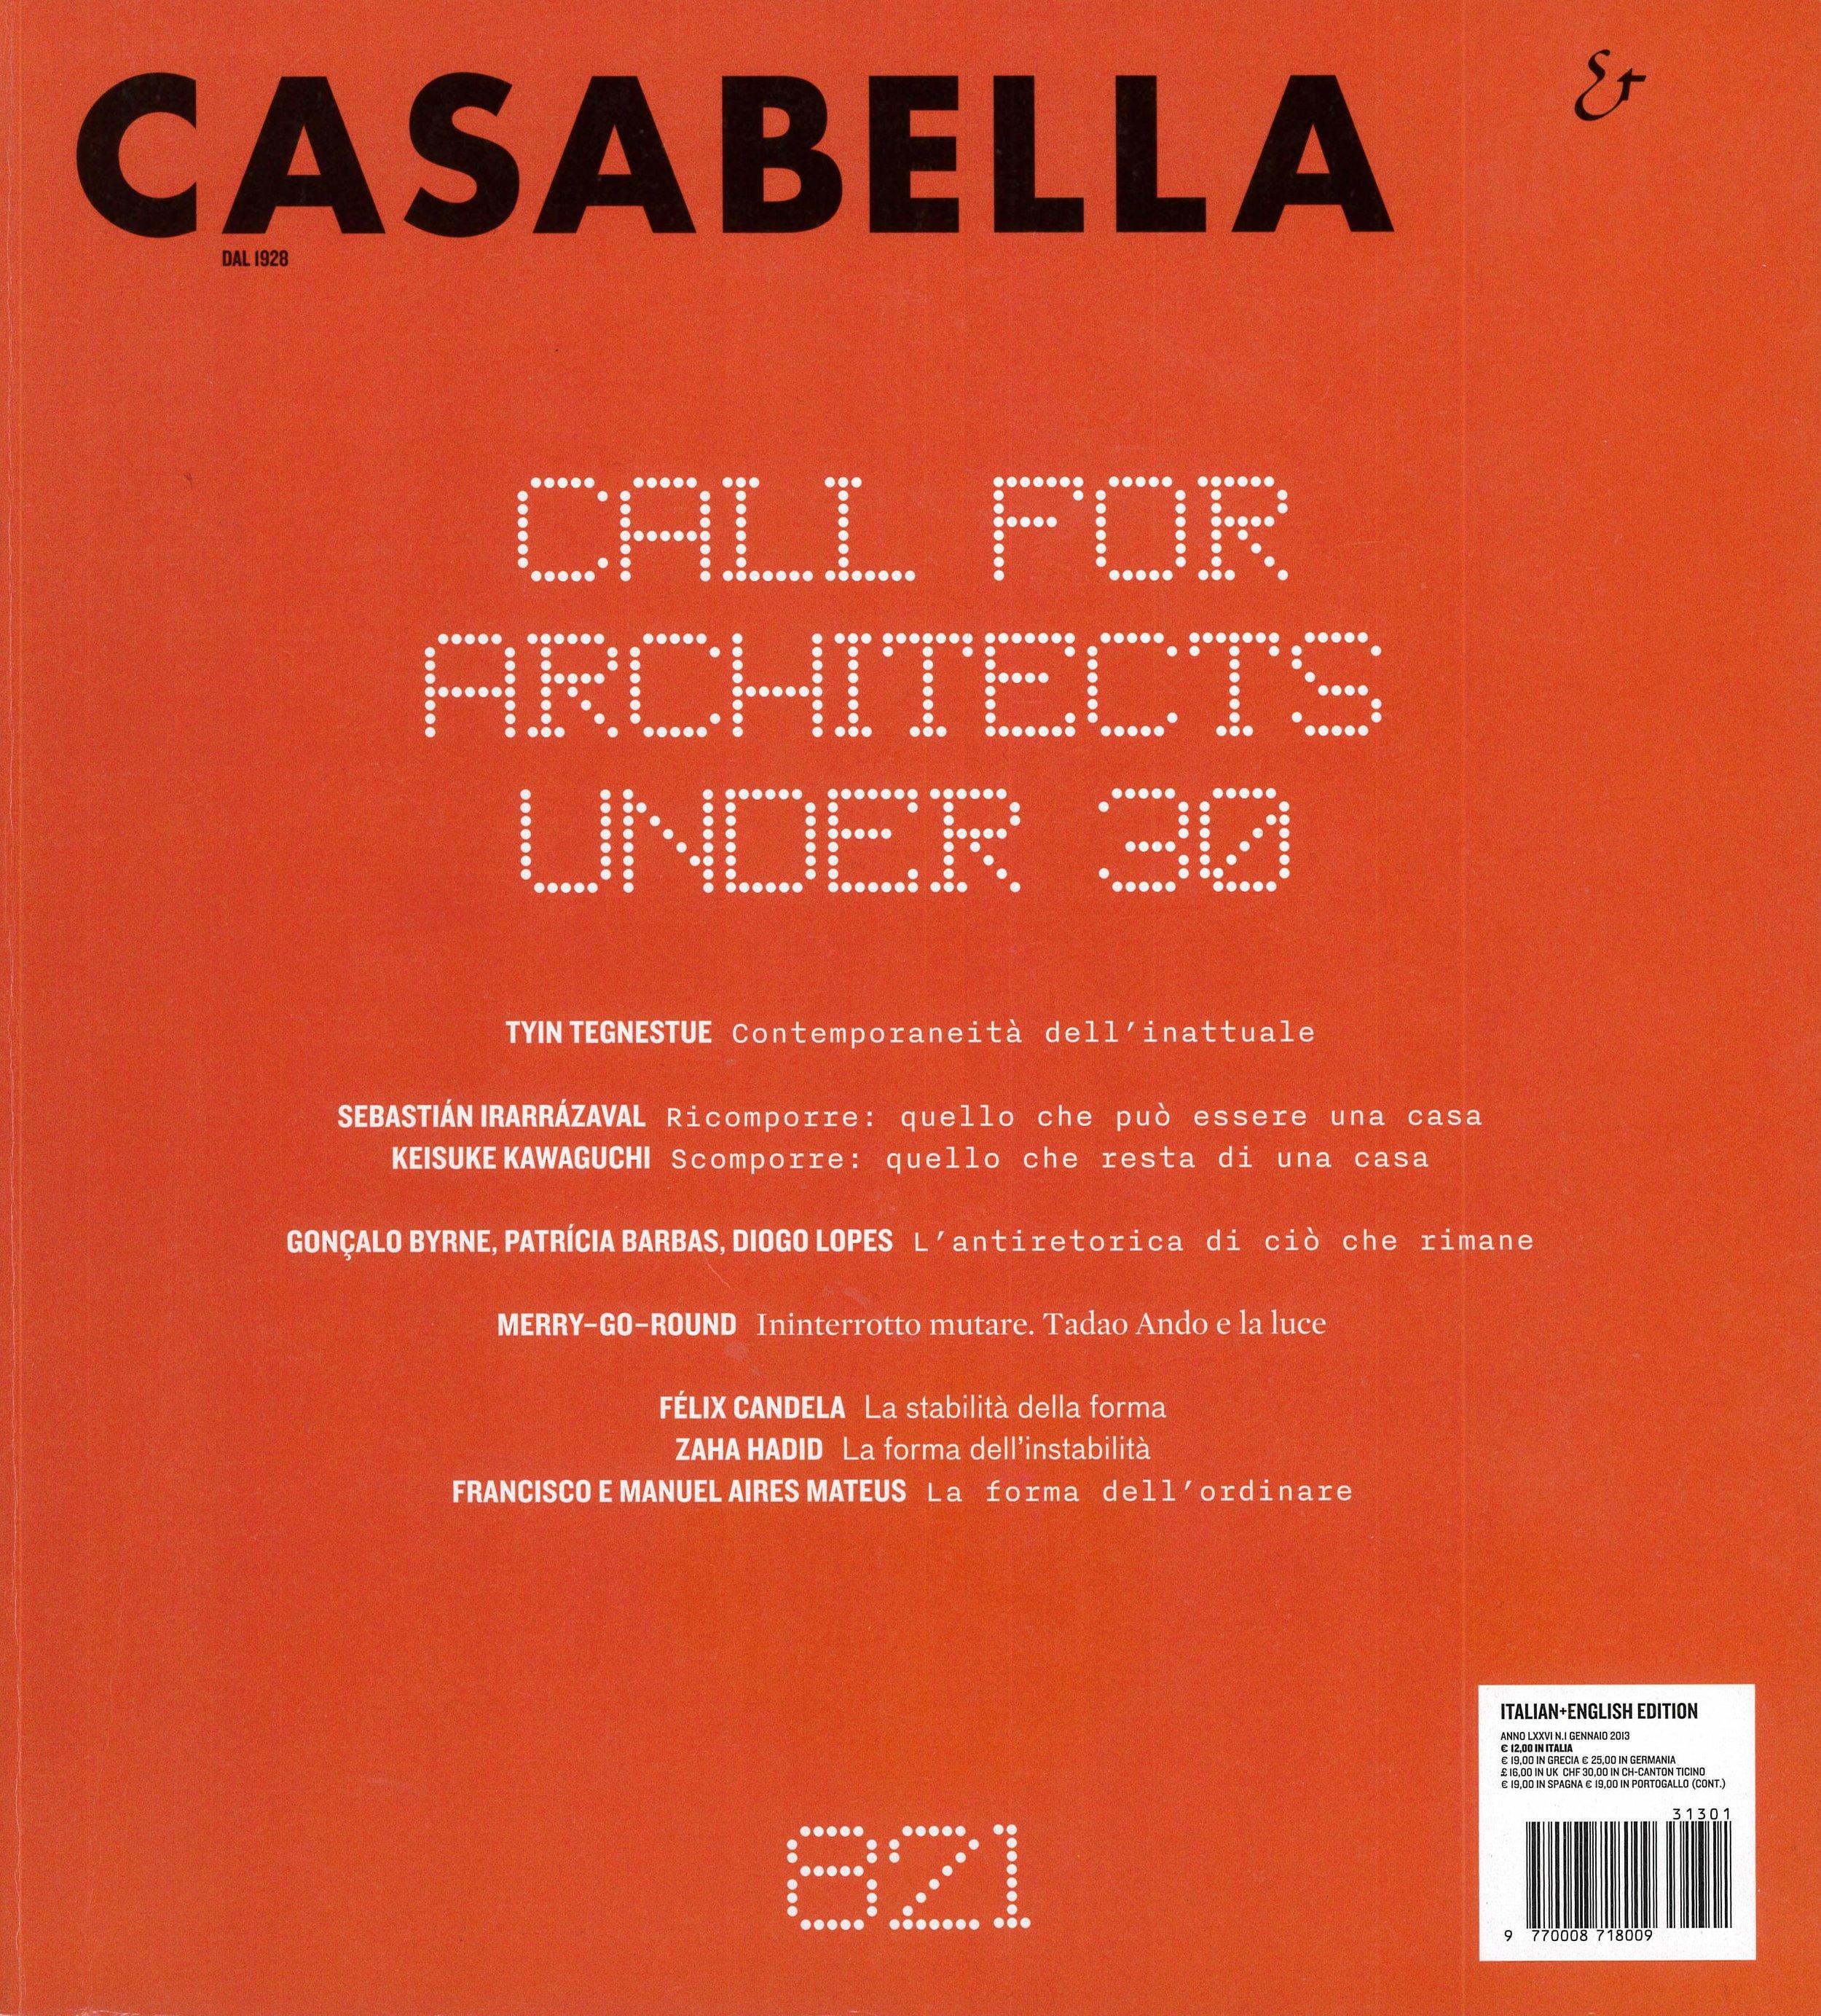 Casabella 821_frontcover.jpg